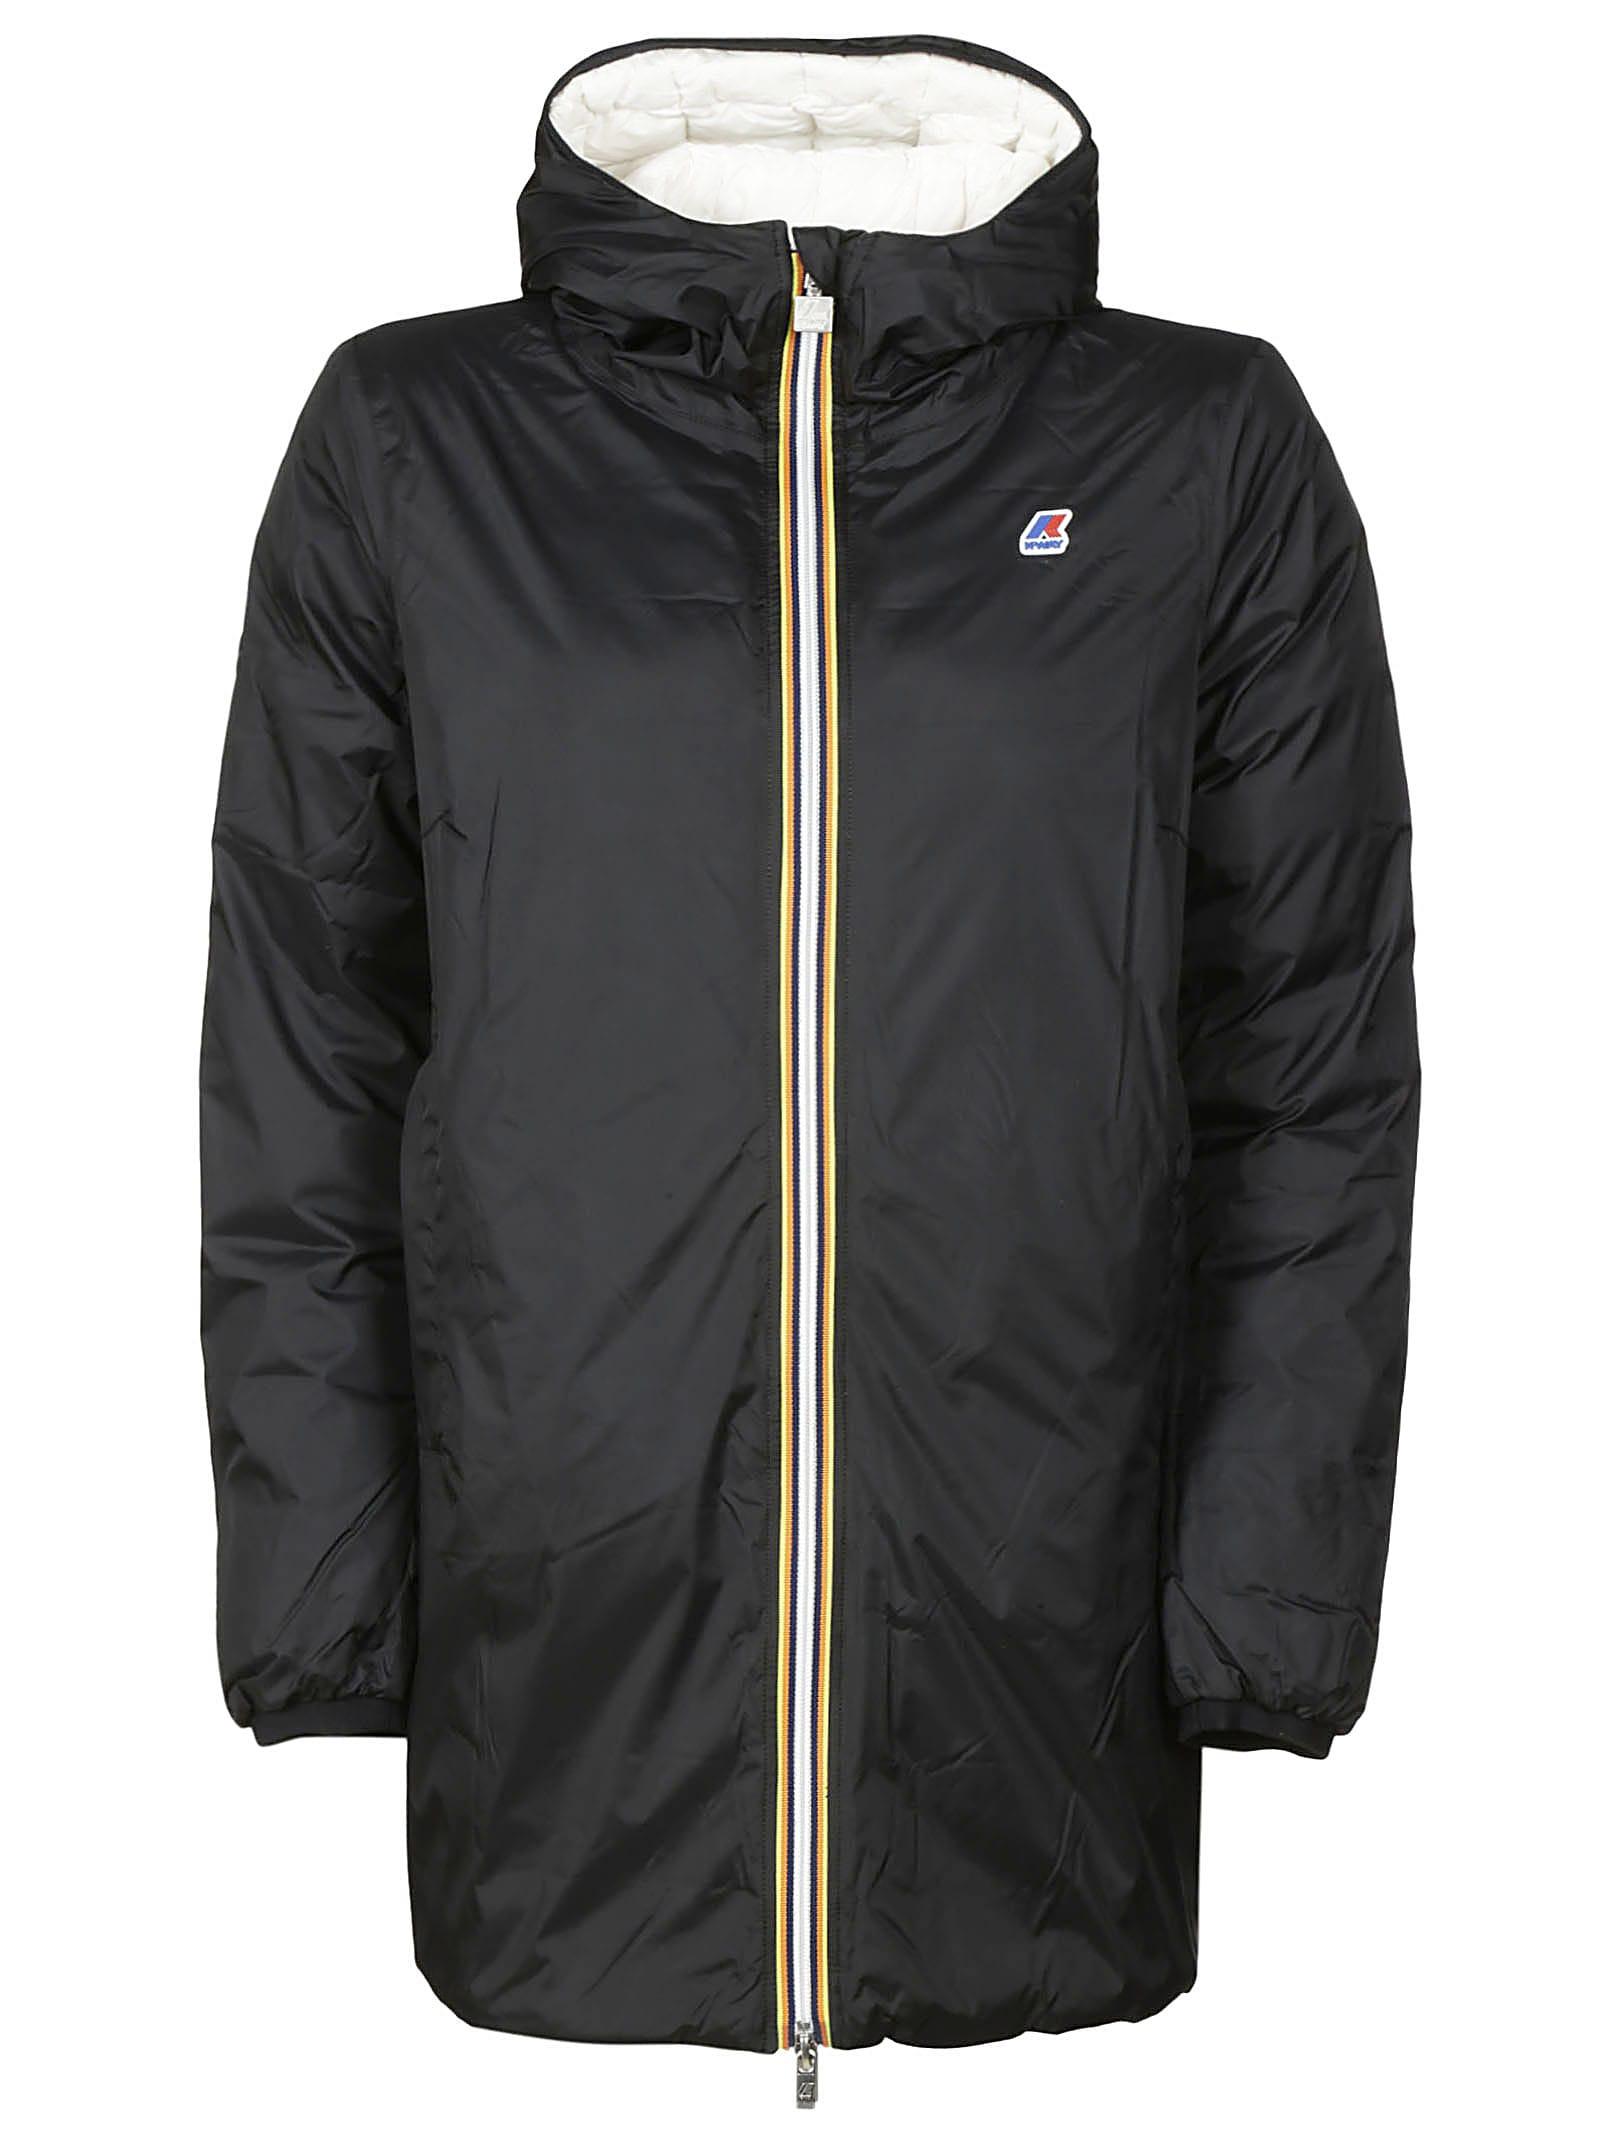 Sophie Thermo Plus Raincoat